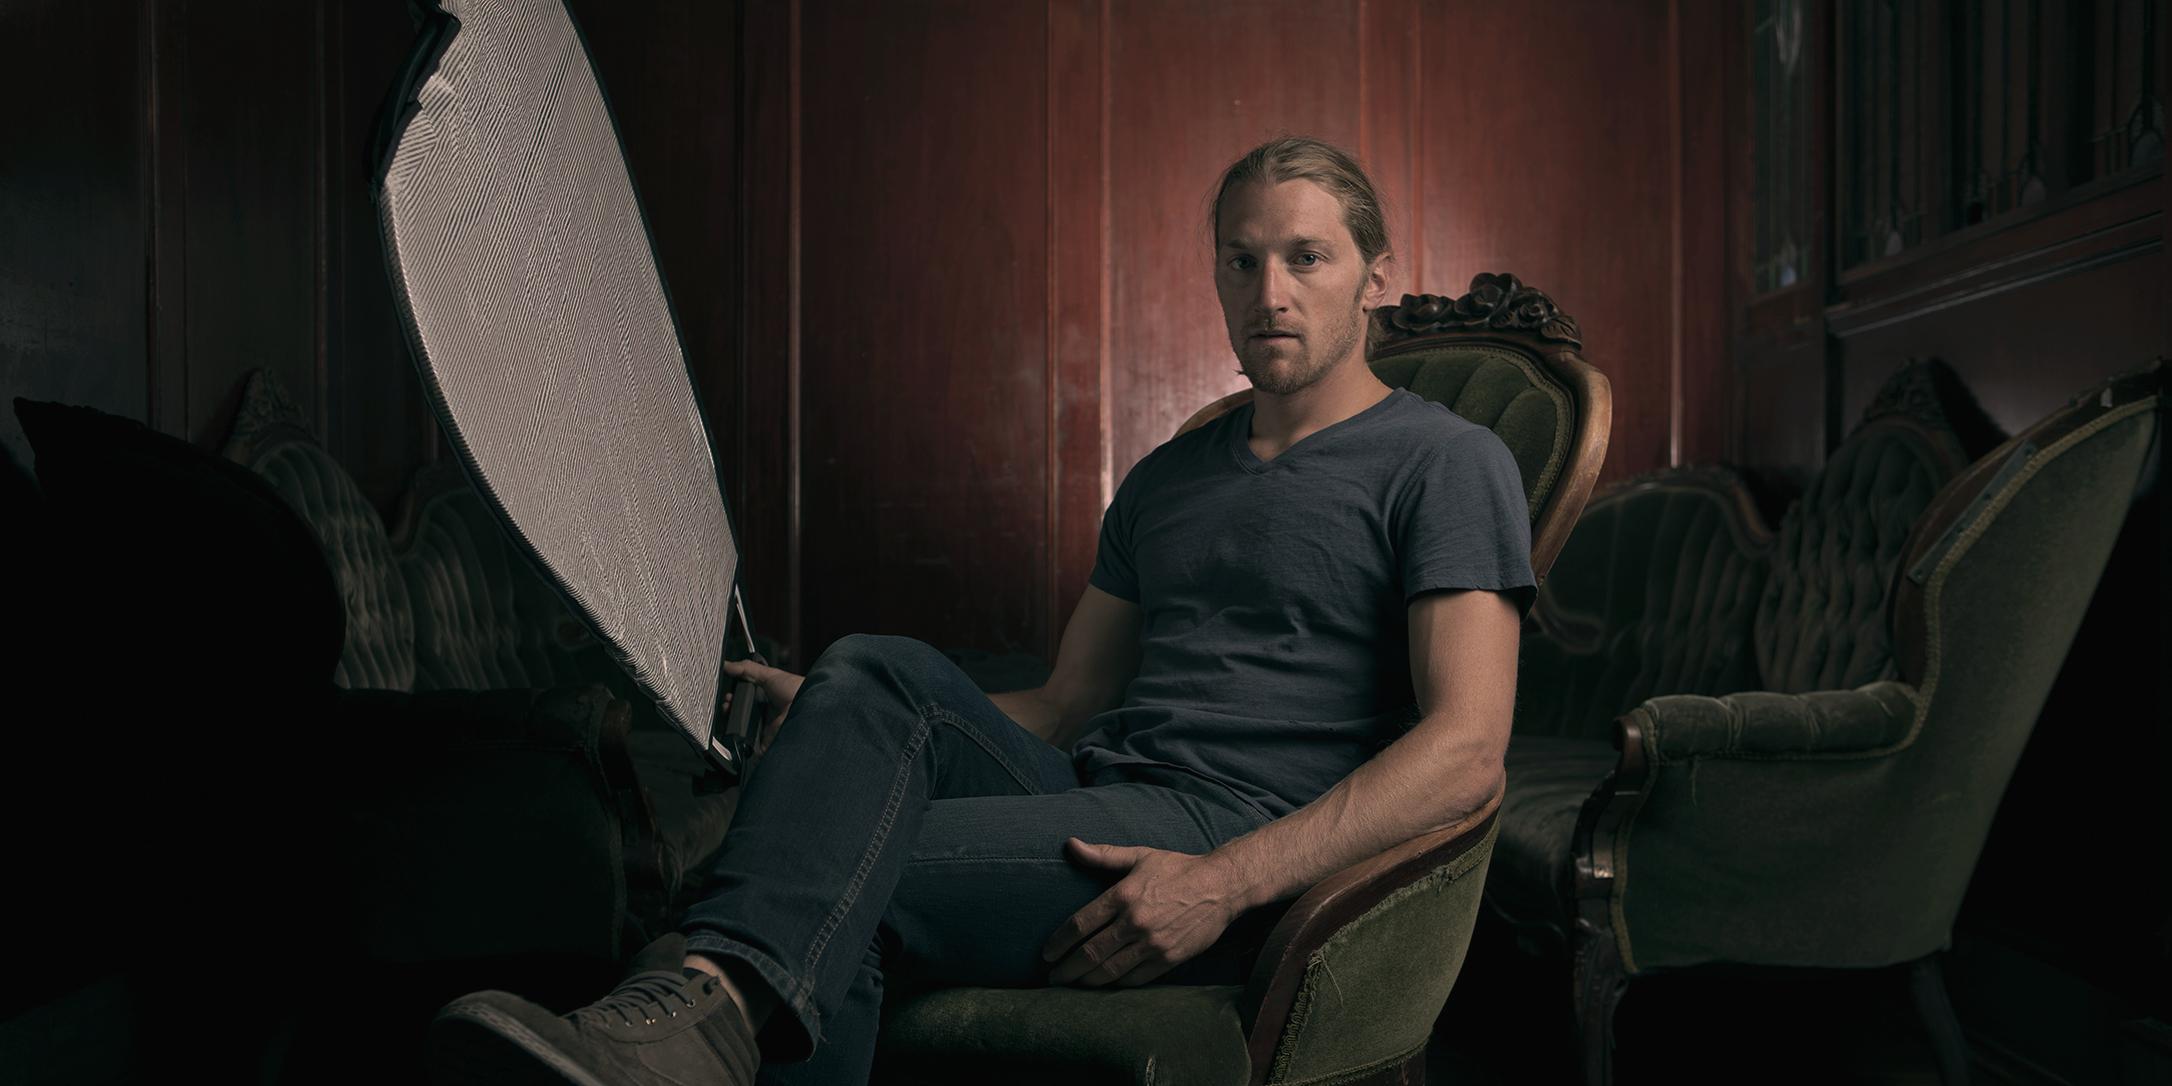 Director Scott Upshur